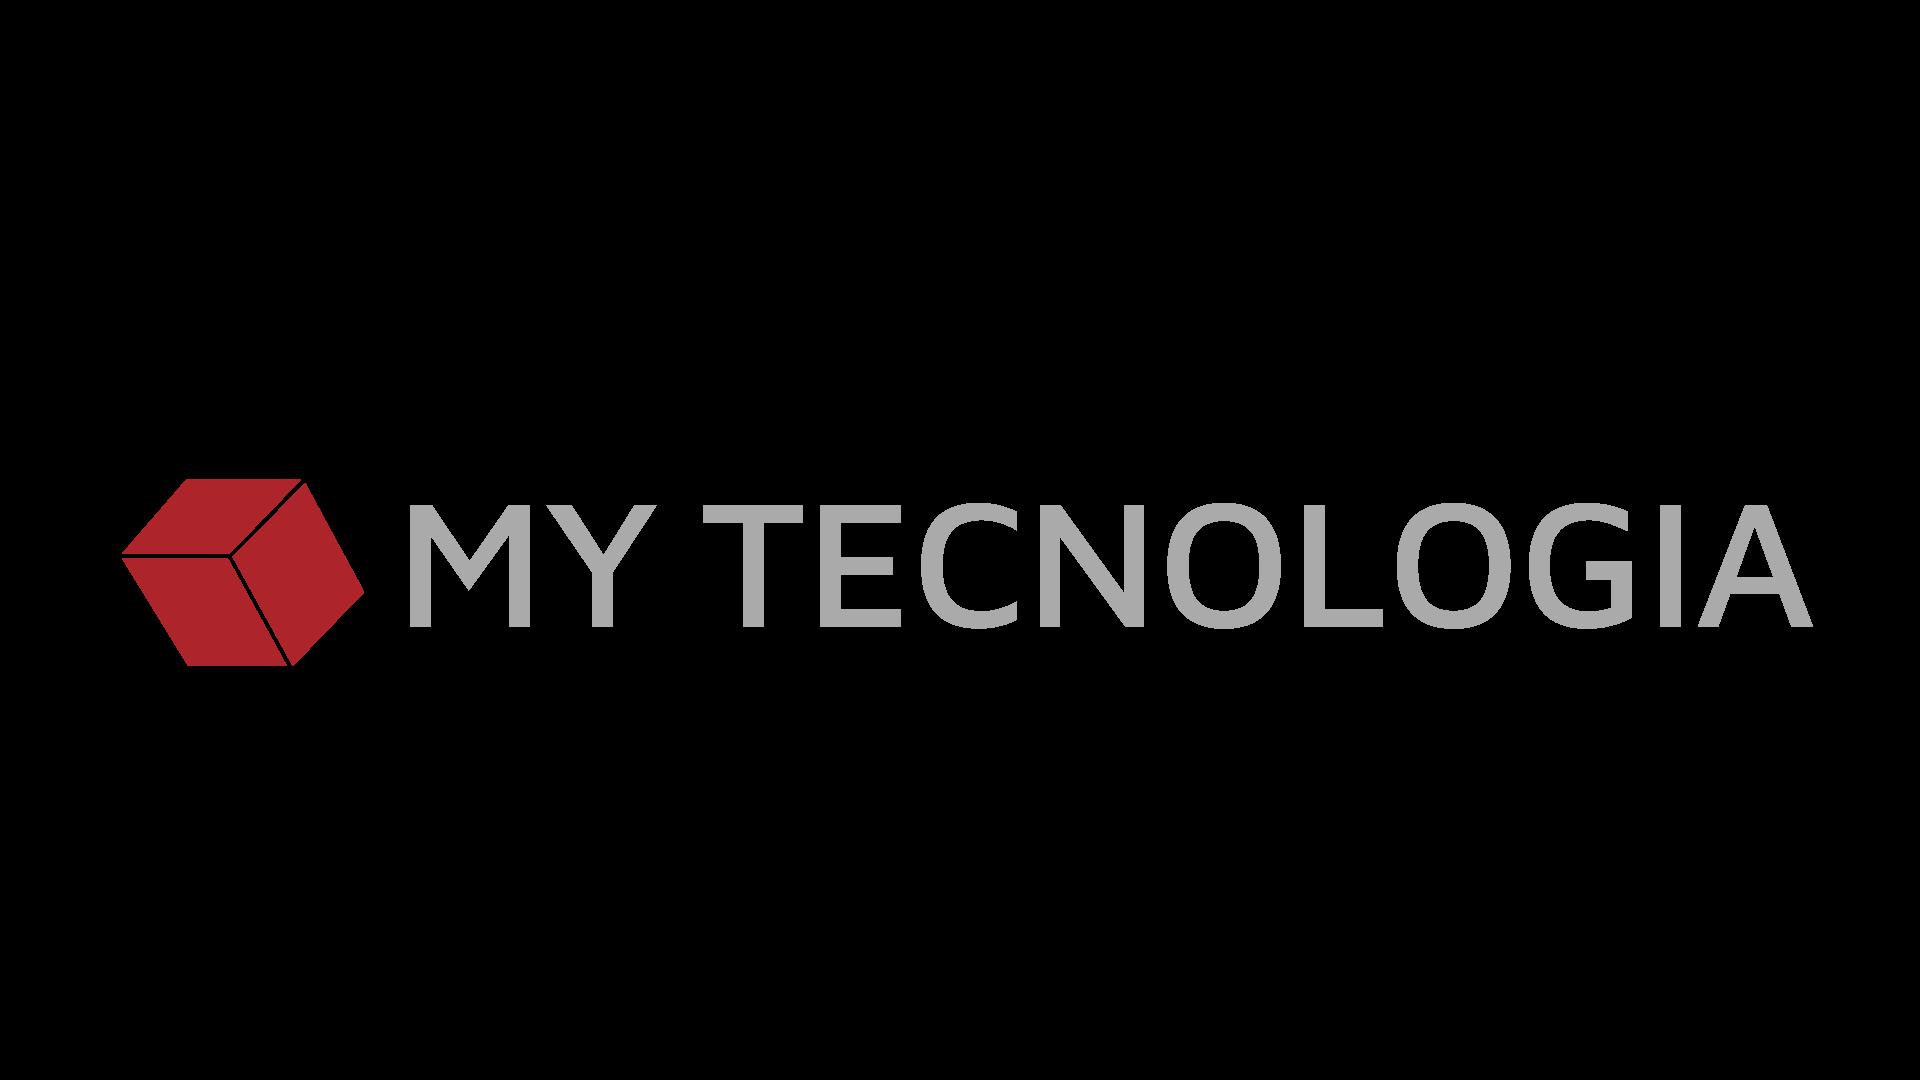 MY TECNOLOGIA